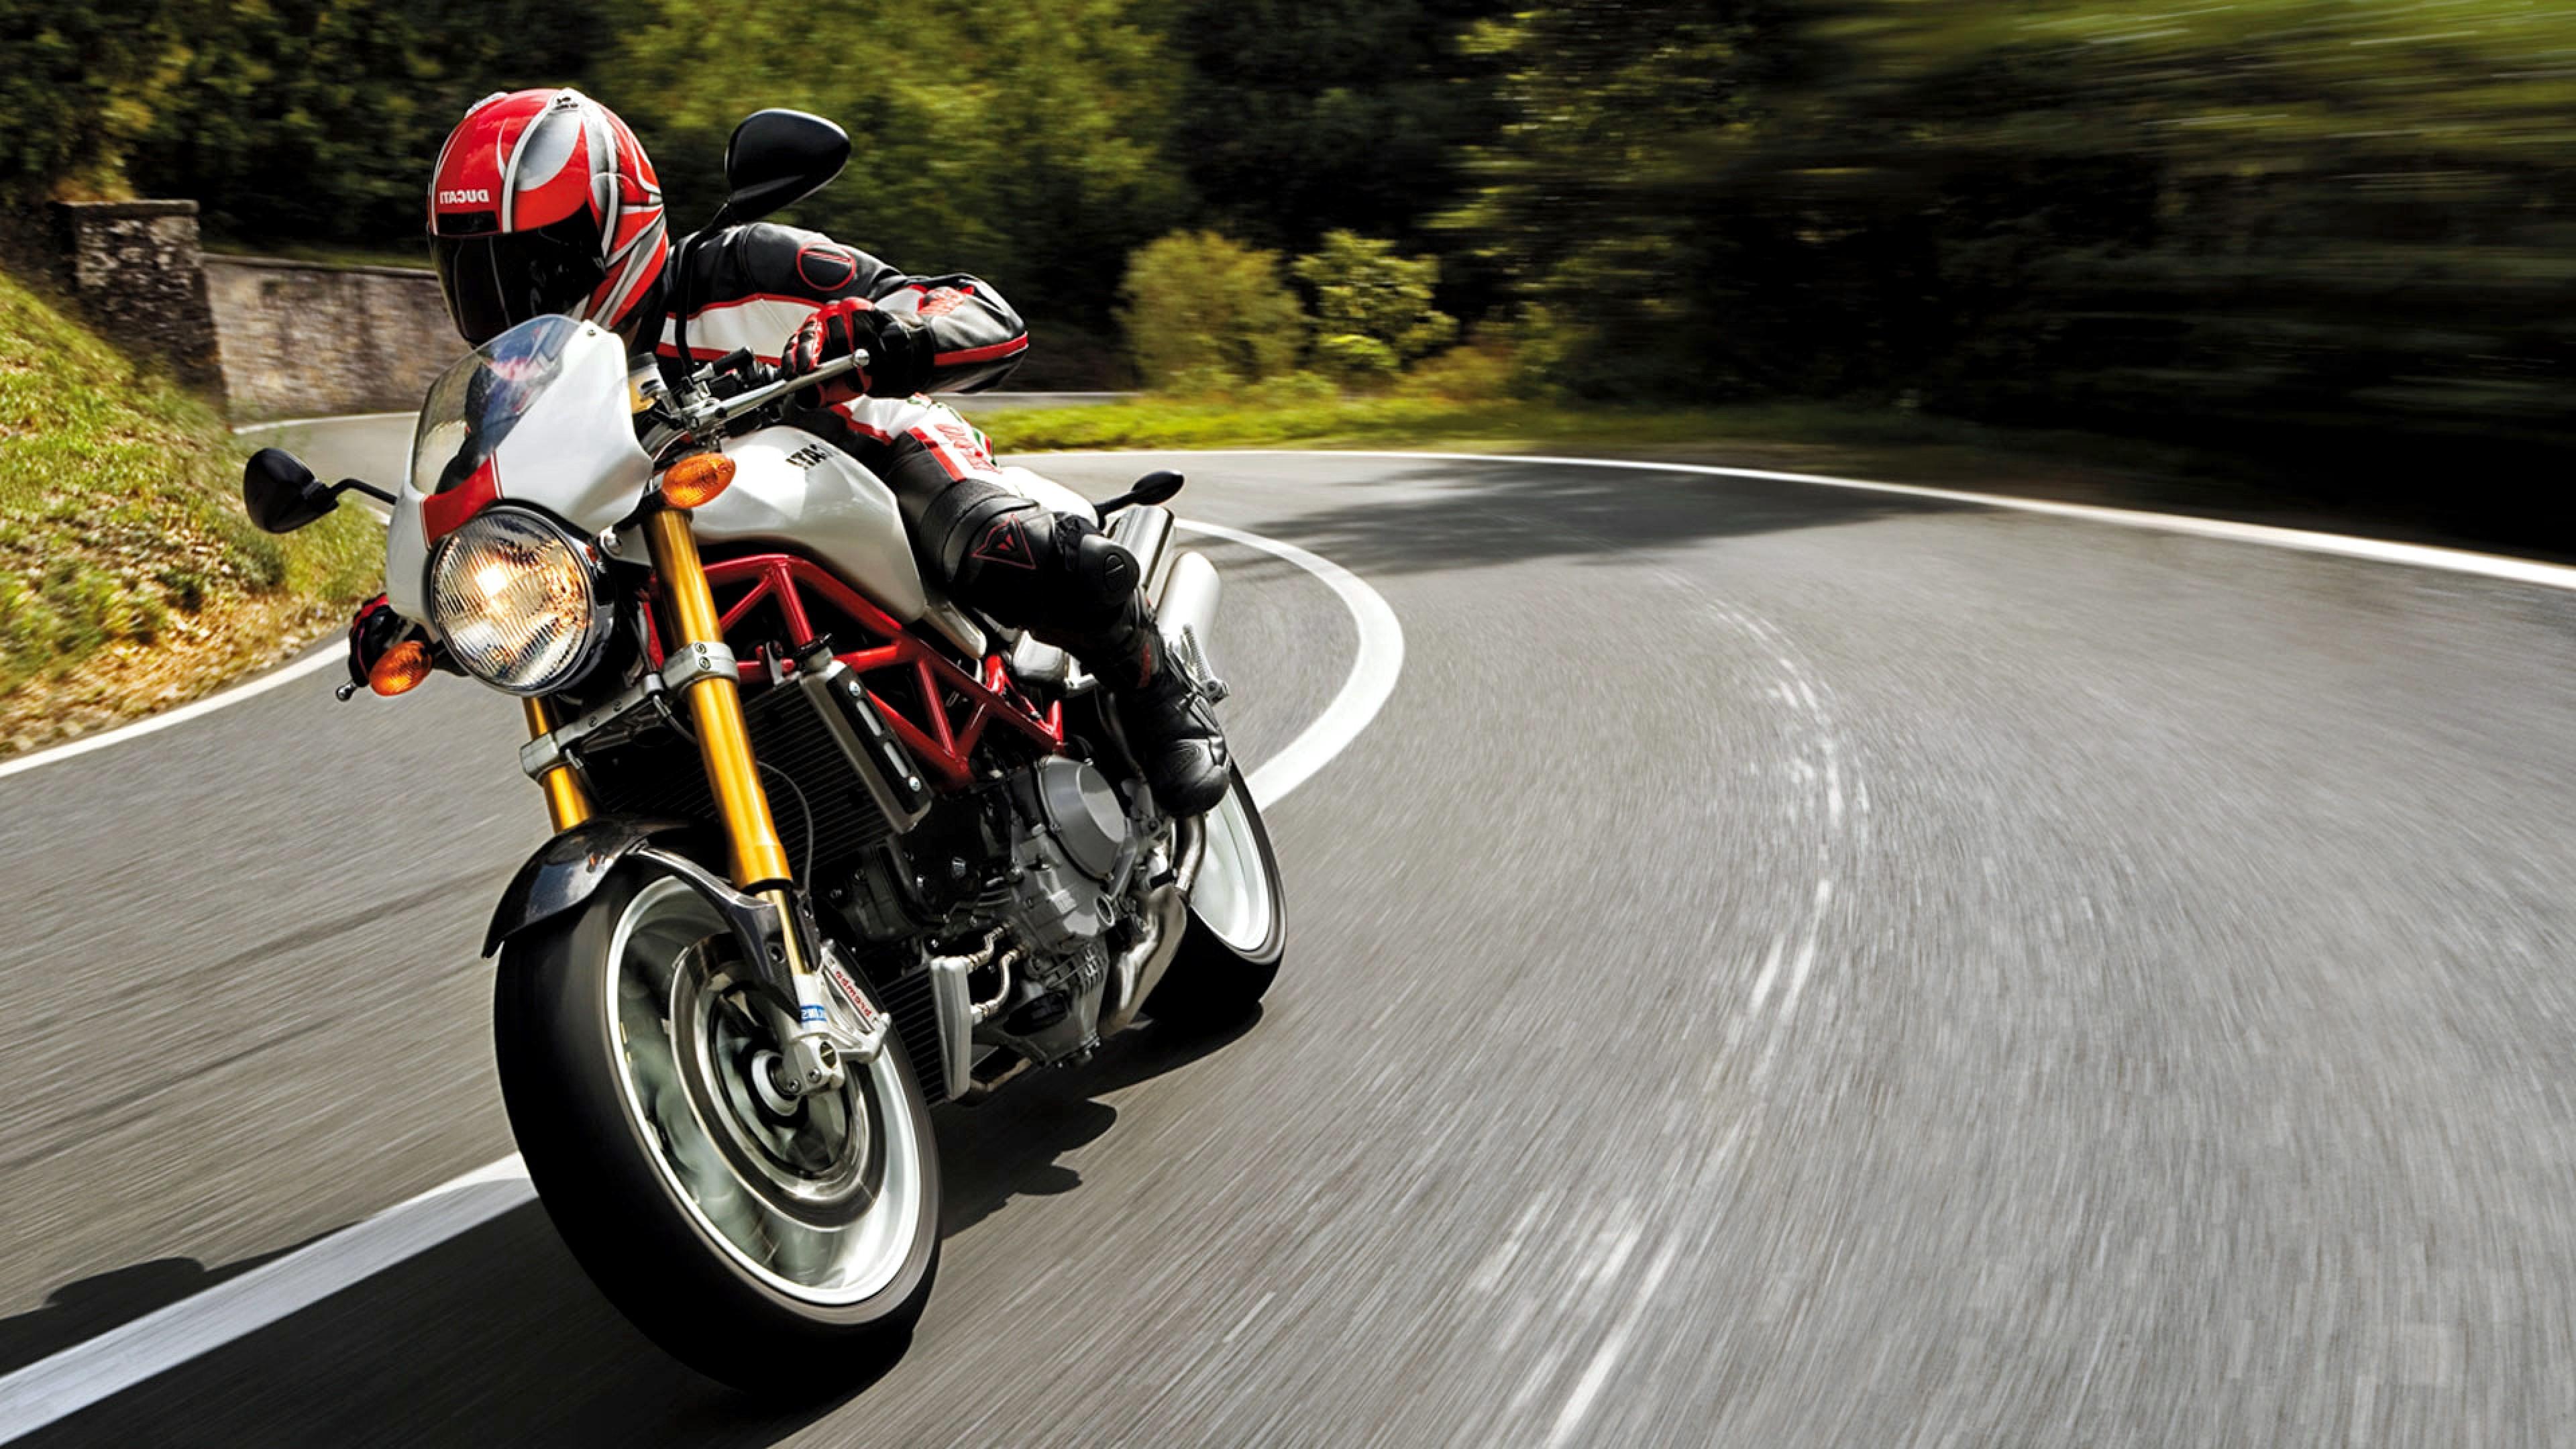 Ducati Monster S4R 4k Red Wallpapers, Ducati Wallpapers